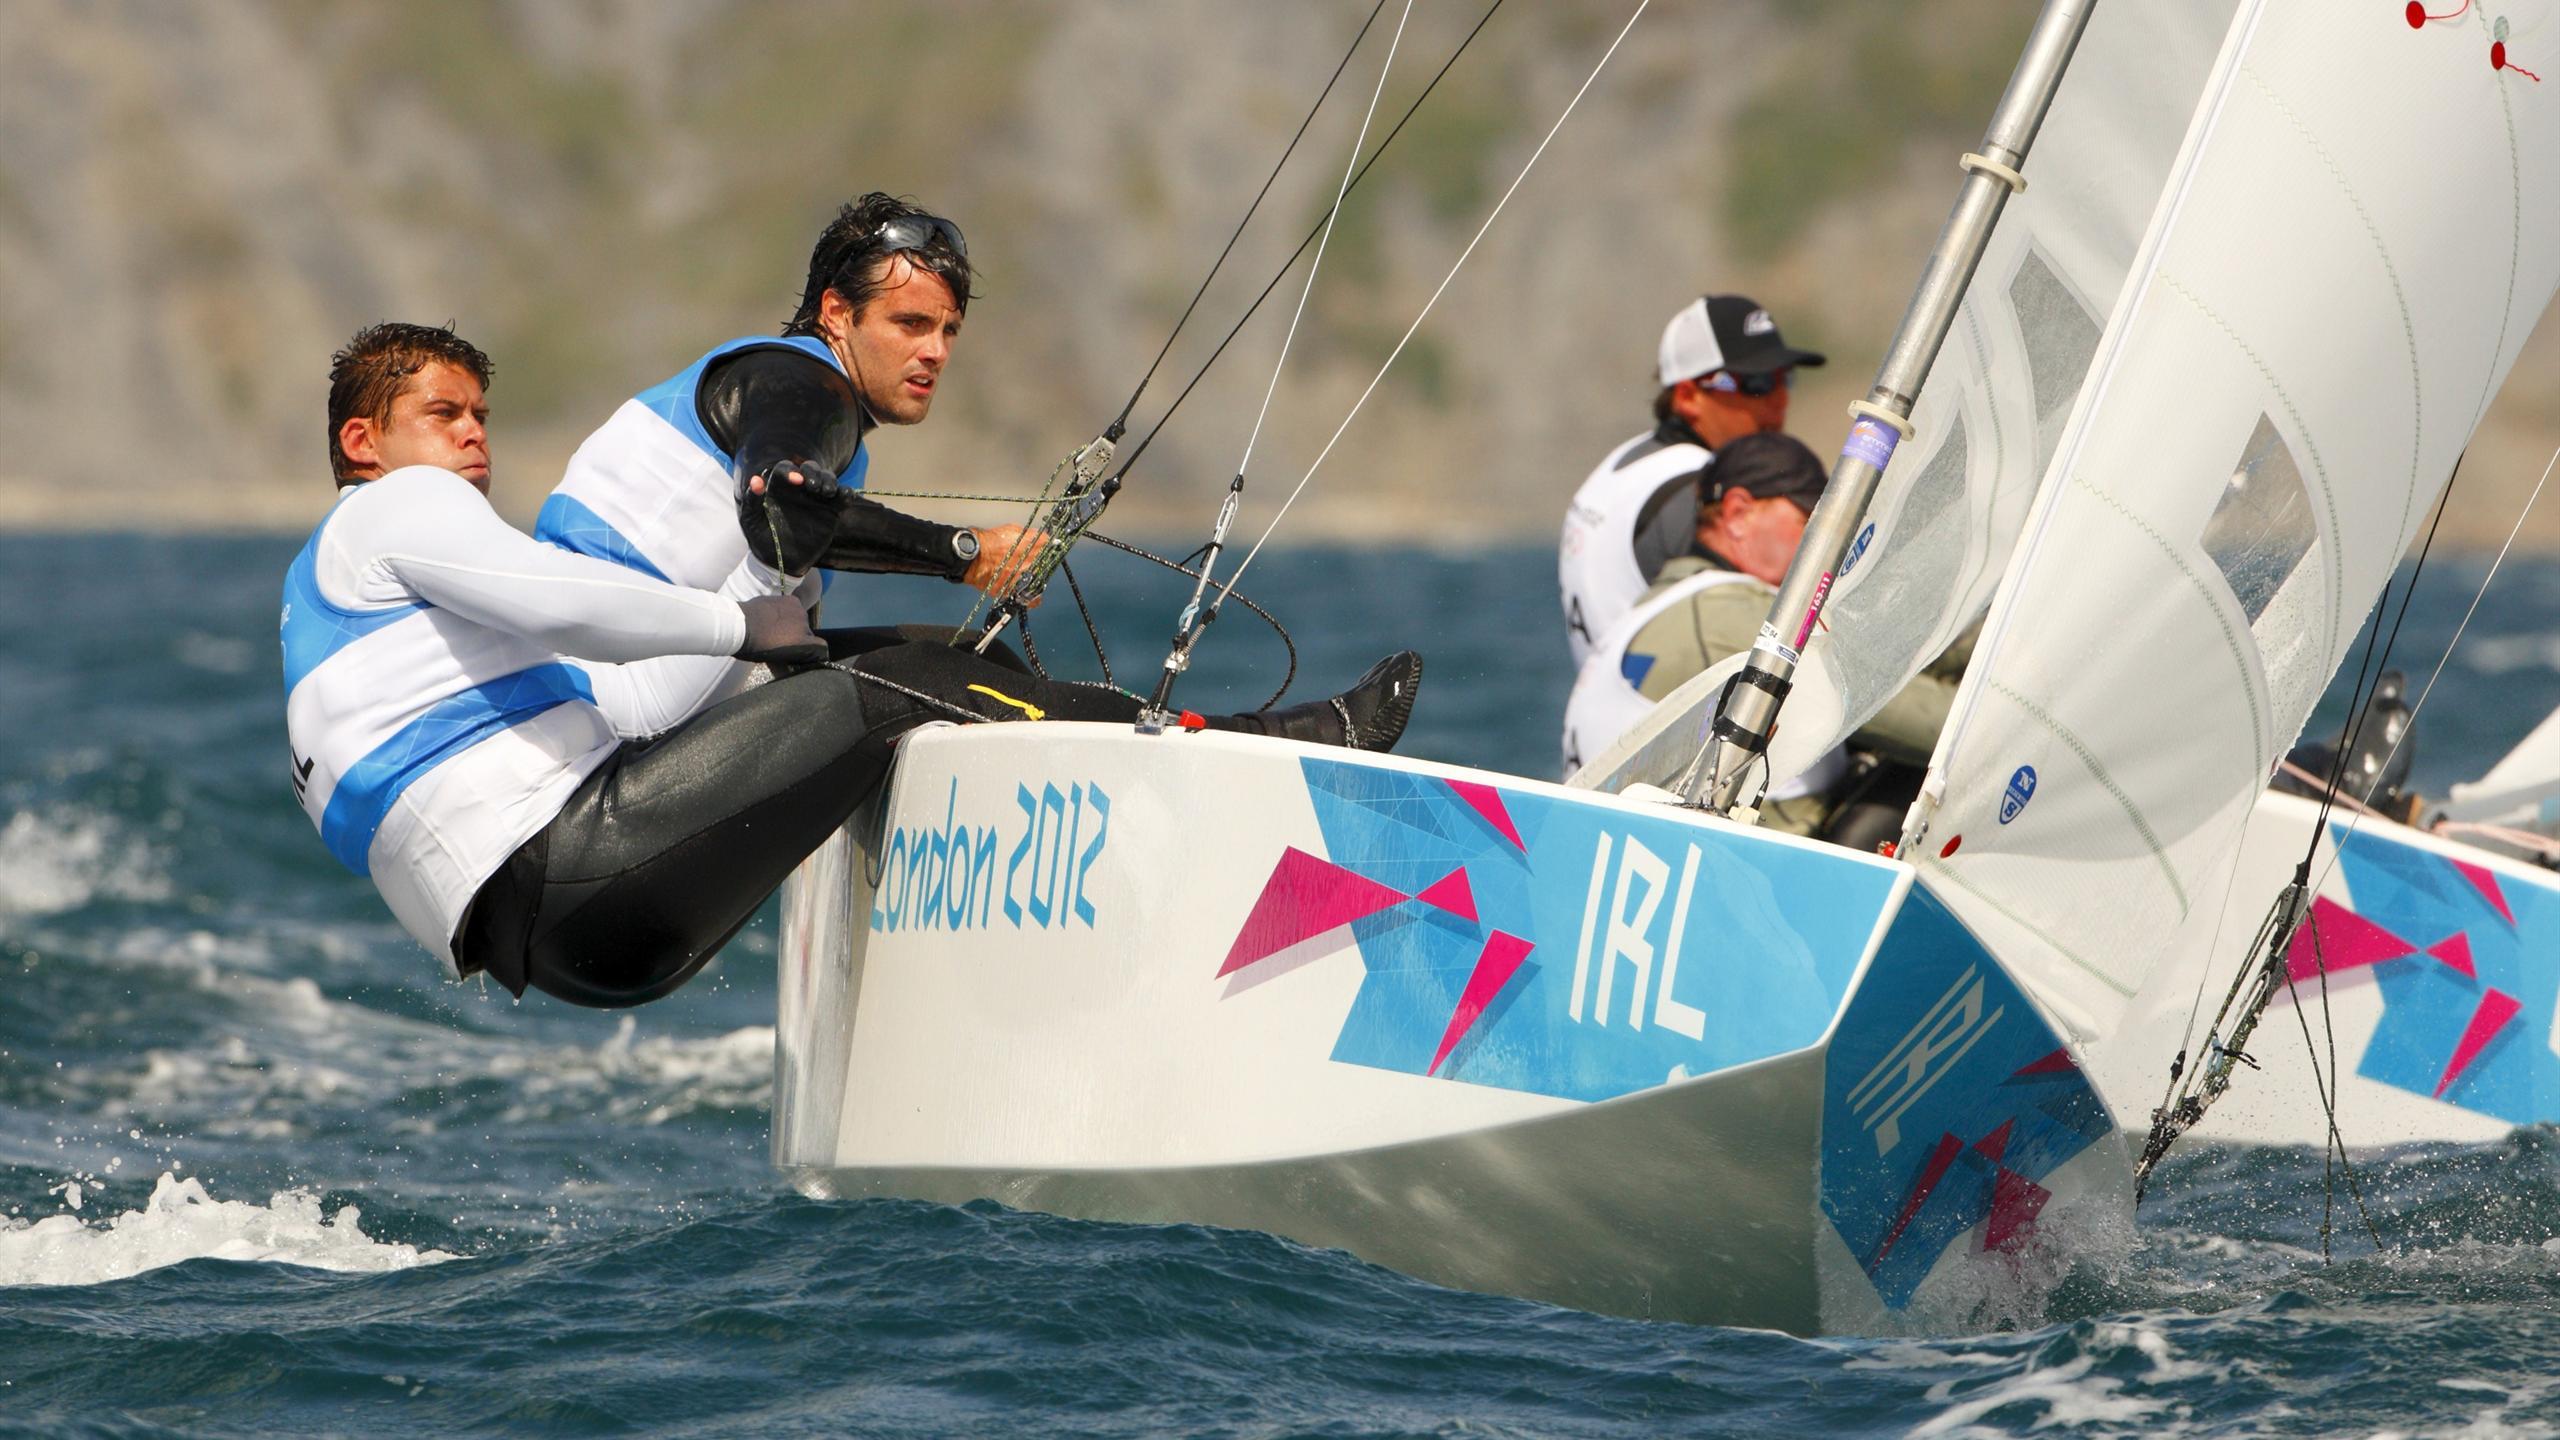 Irish 2000 guineas betting 2021 olympics mauro betting netonnet